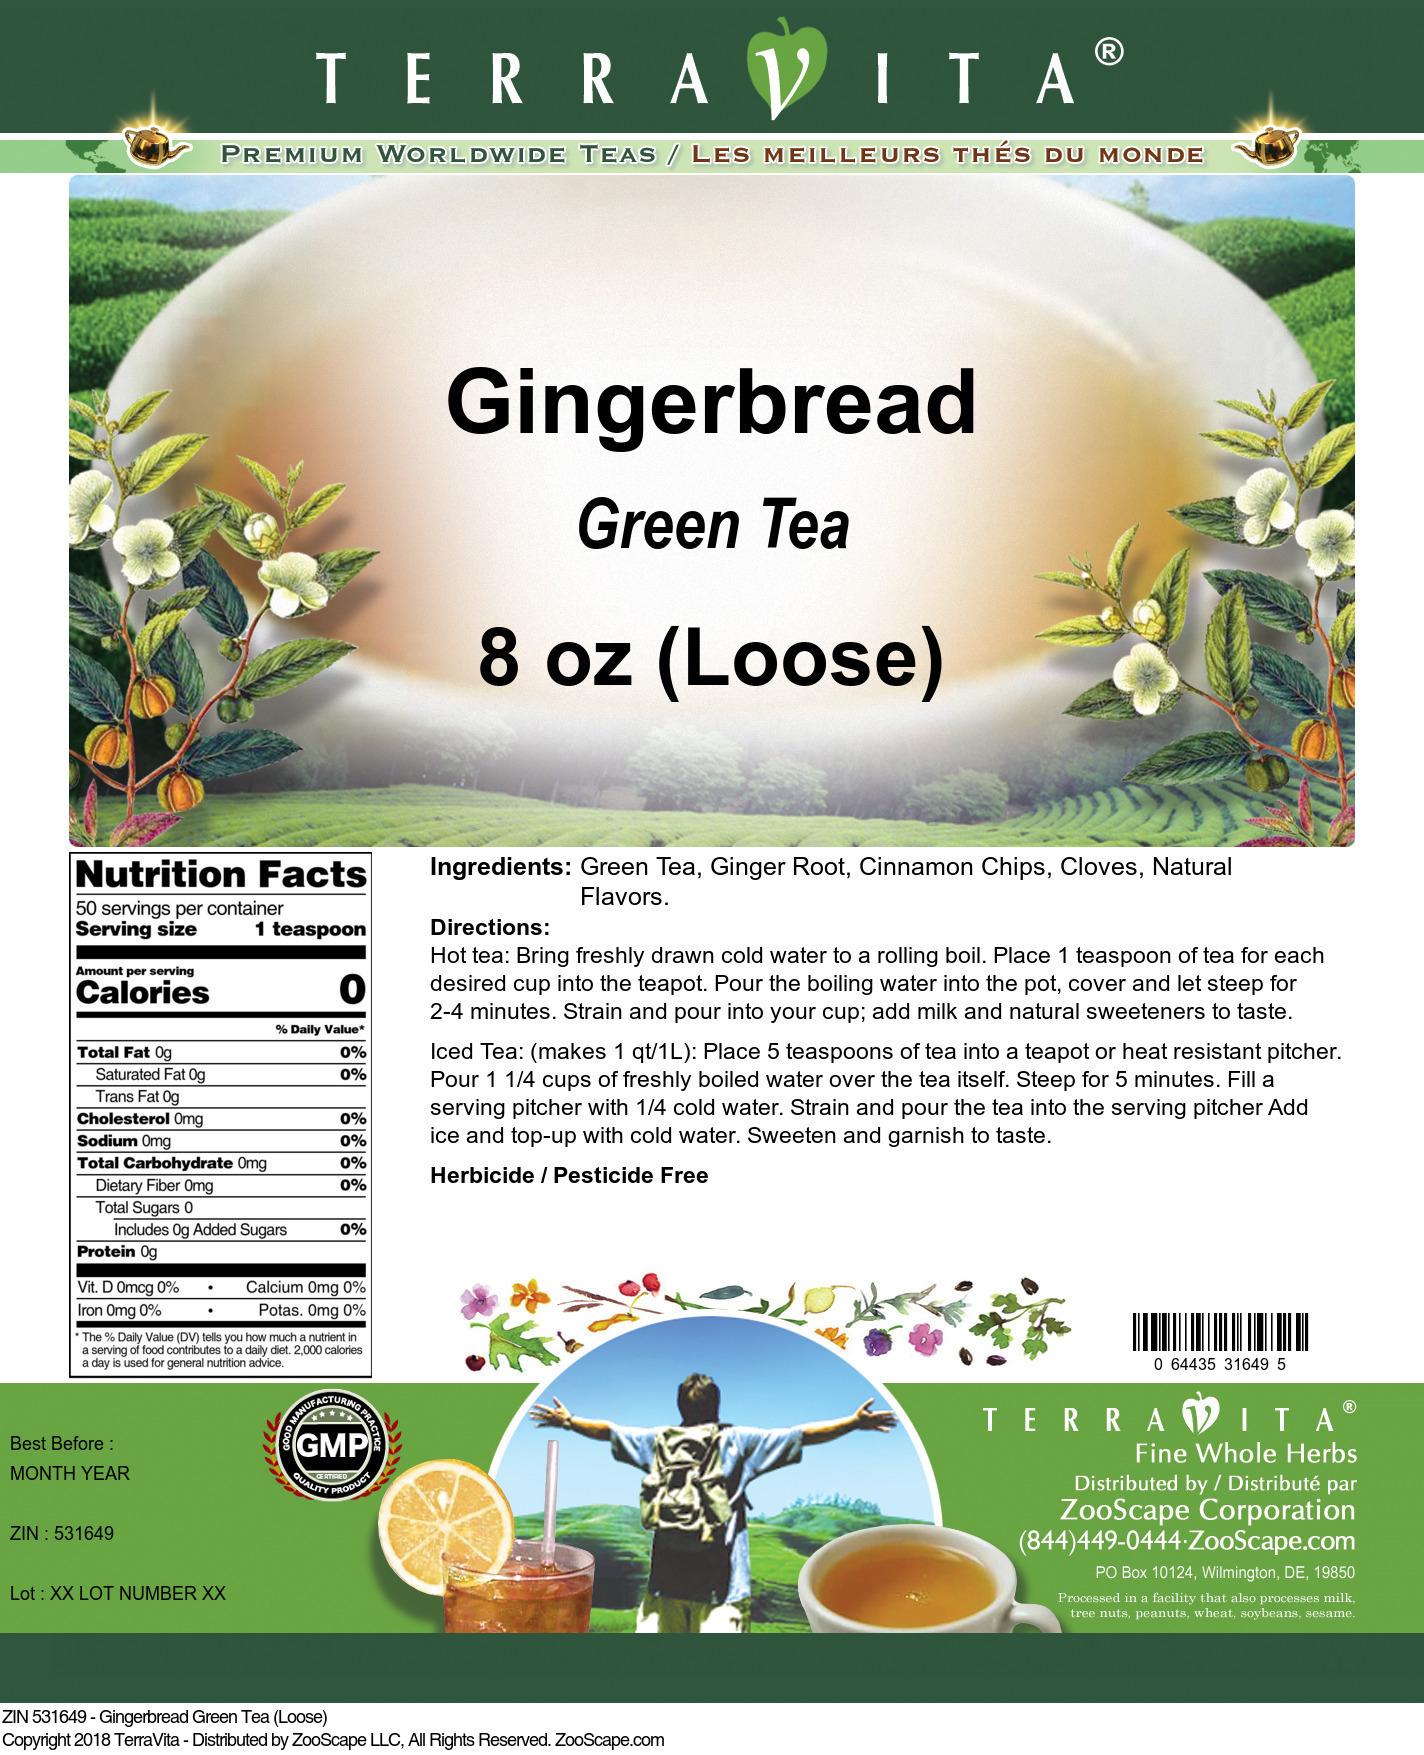 Gingerbread Green Tea (Loose)